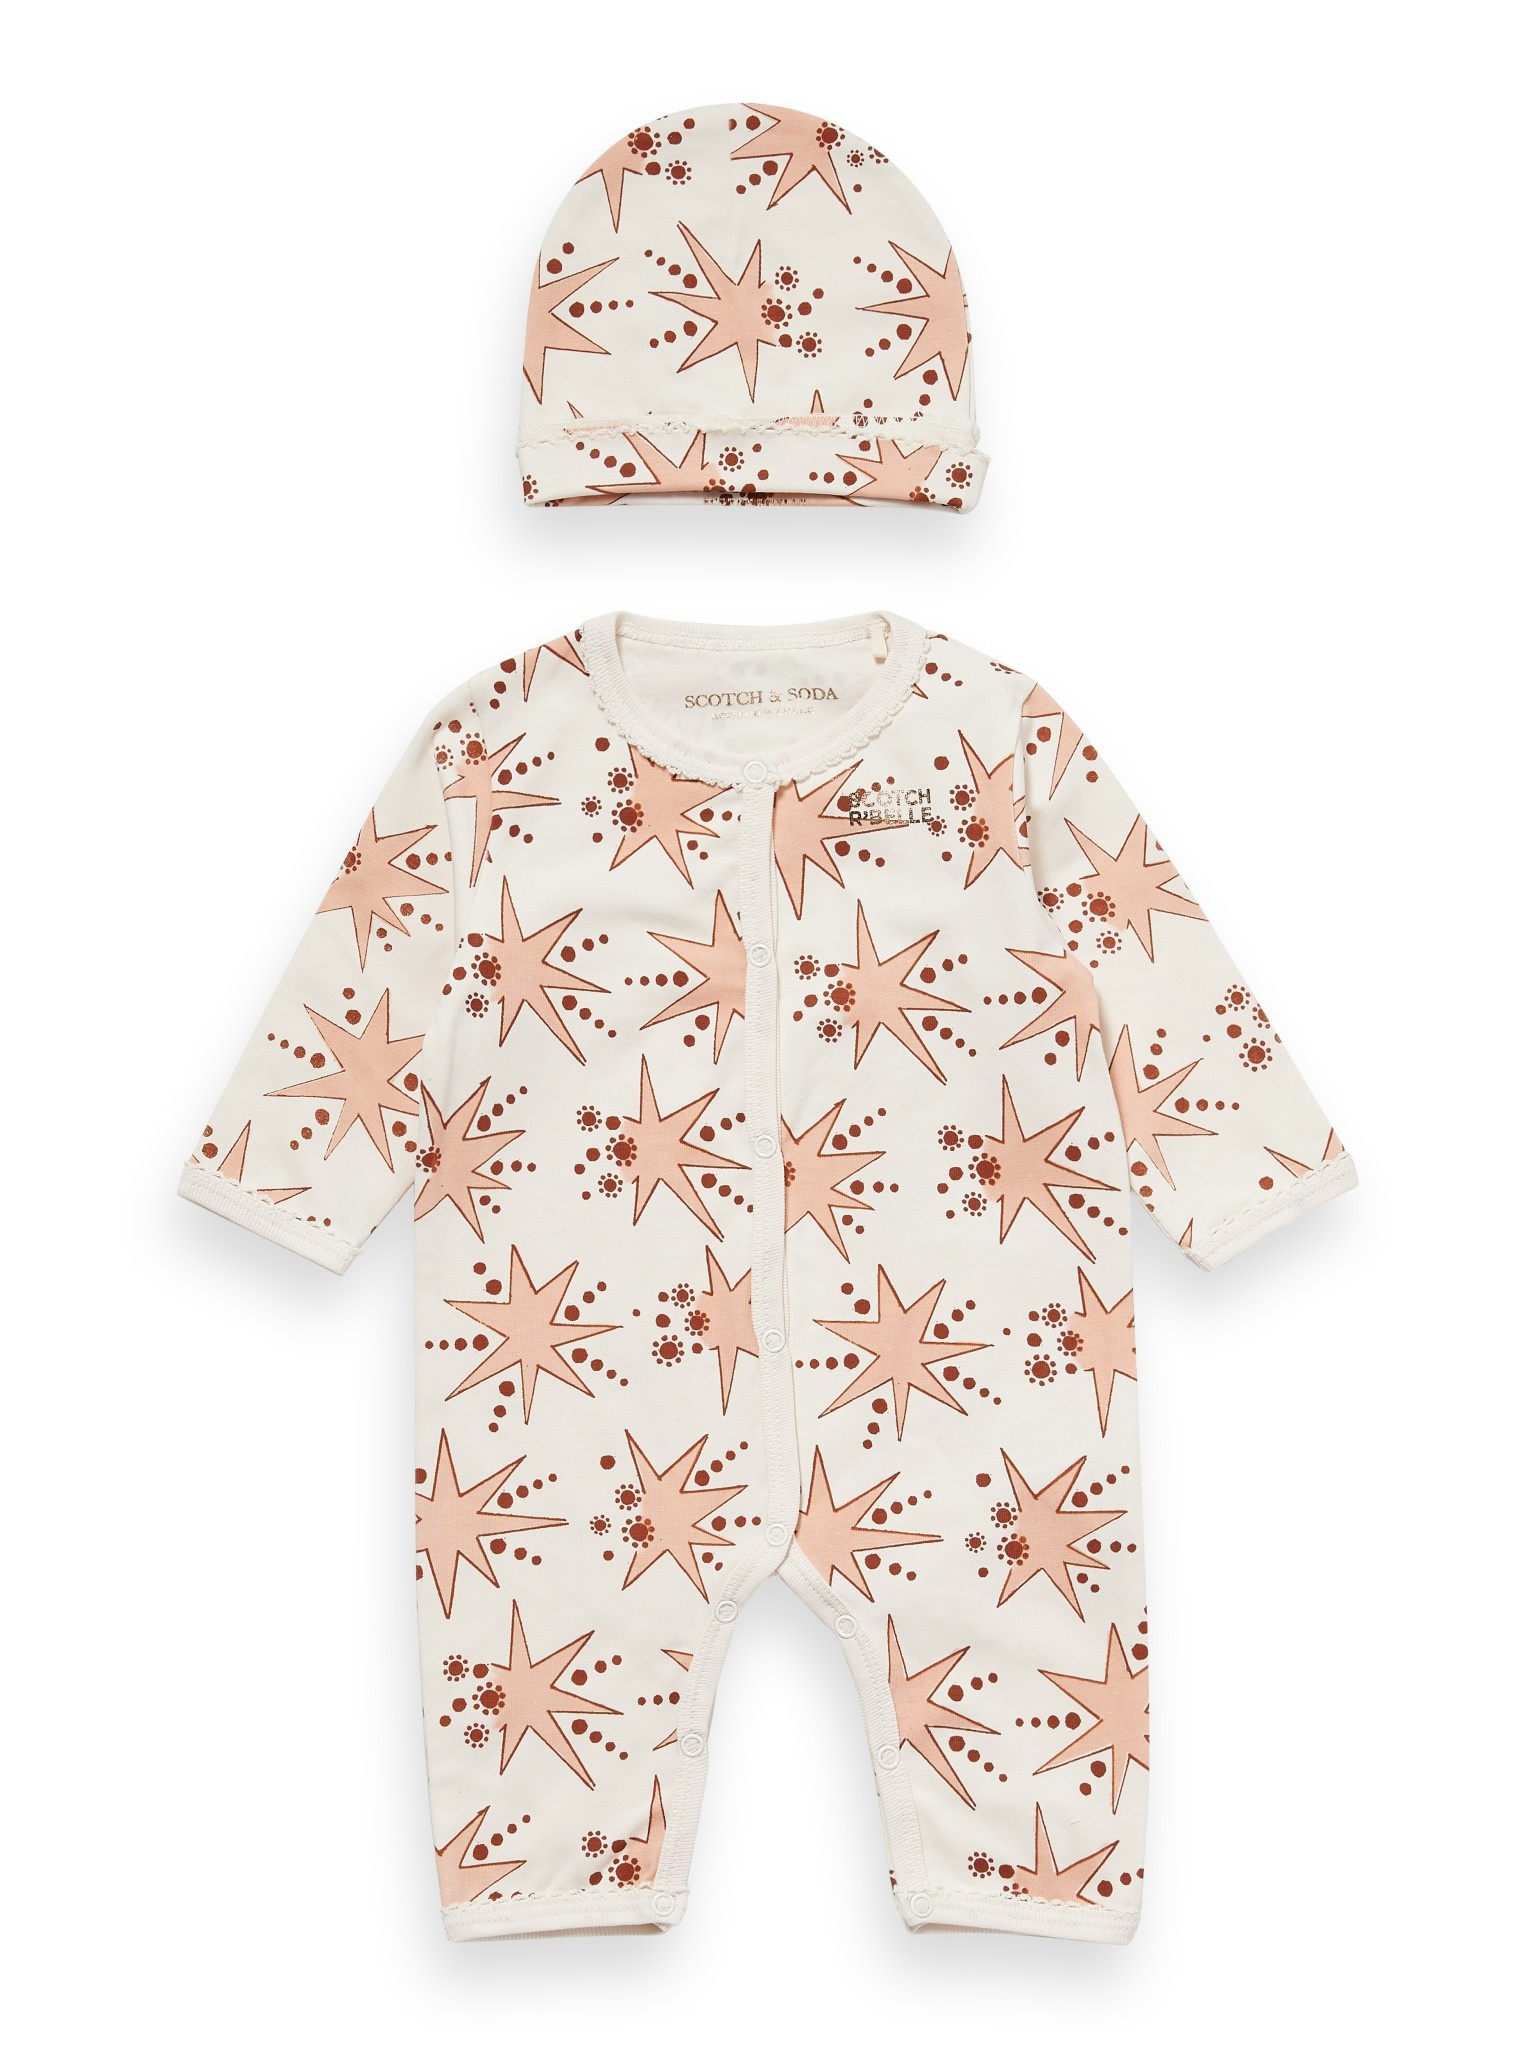 Scotch Rbelle Scotch - Baby gift set 0598, 0-3 month, 158241